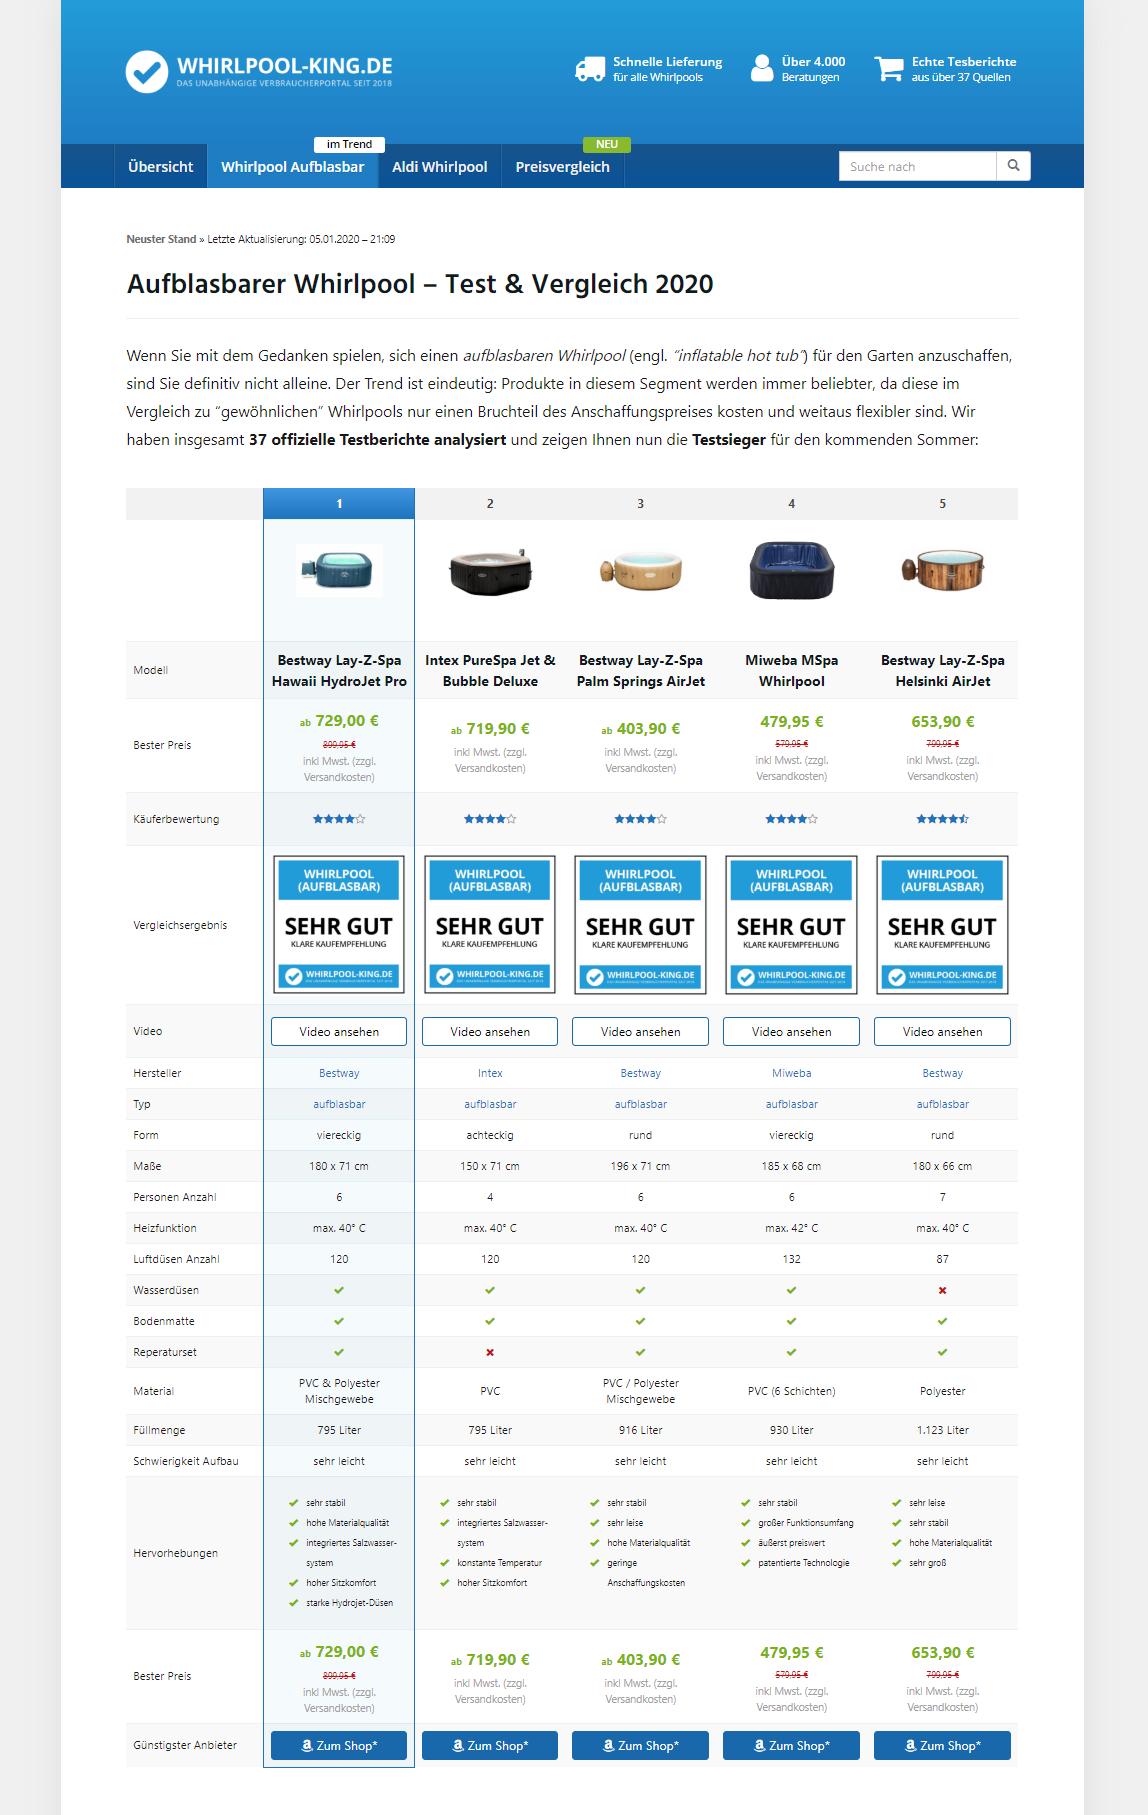 Screenshot: whirlpool-king.de / aufblasbarer Whirlpool Test & Vergleich